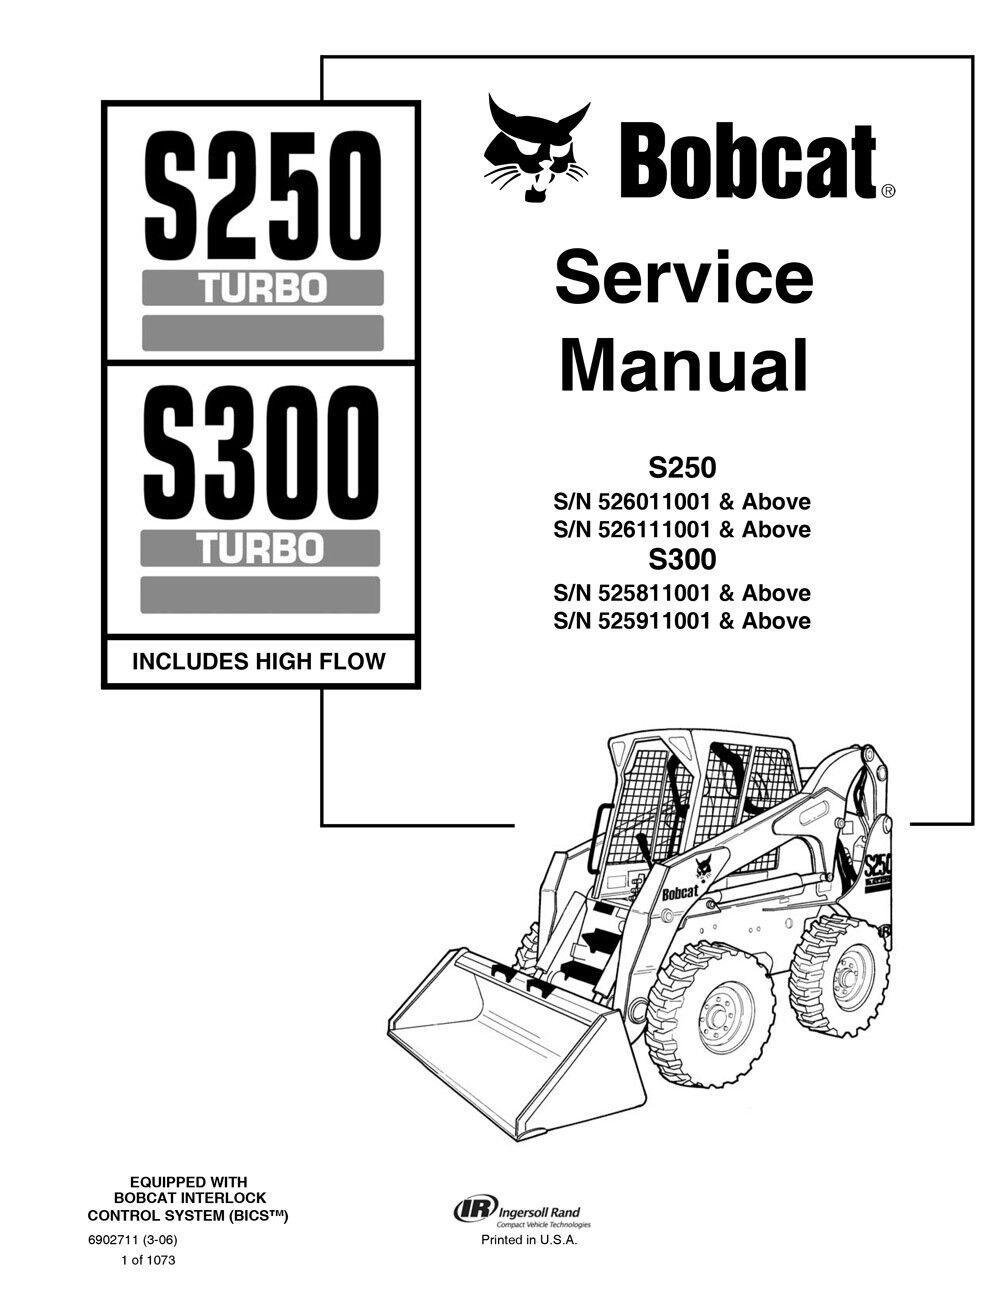 Bobcat S250 & S300 Turbo Skid Steer Loader Service Manual 1070 Pgs 6902711    eBay